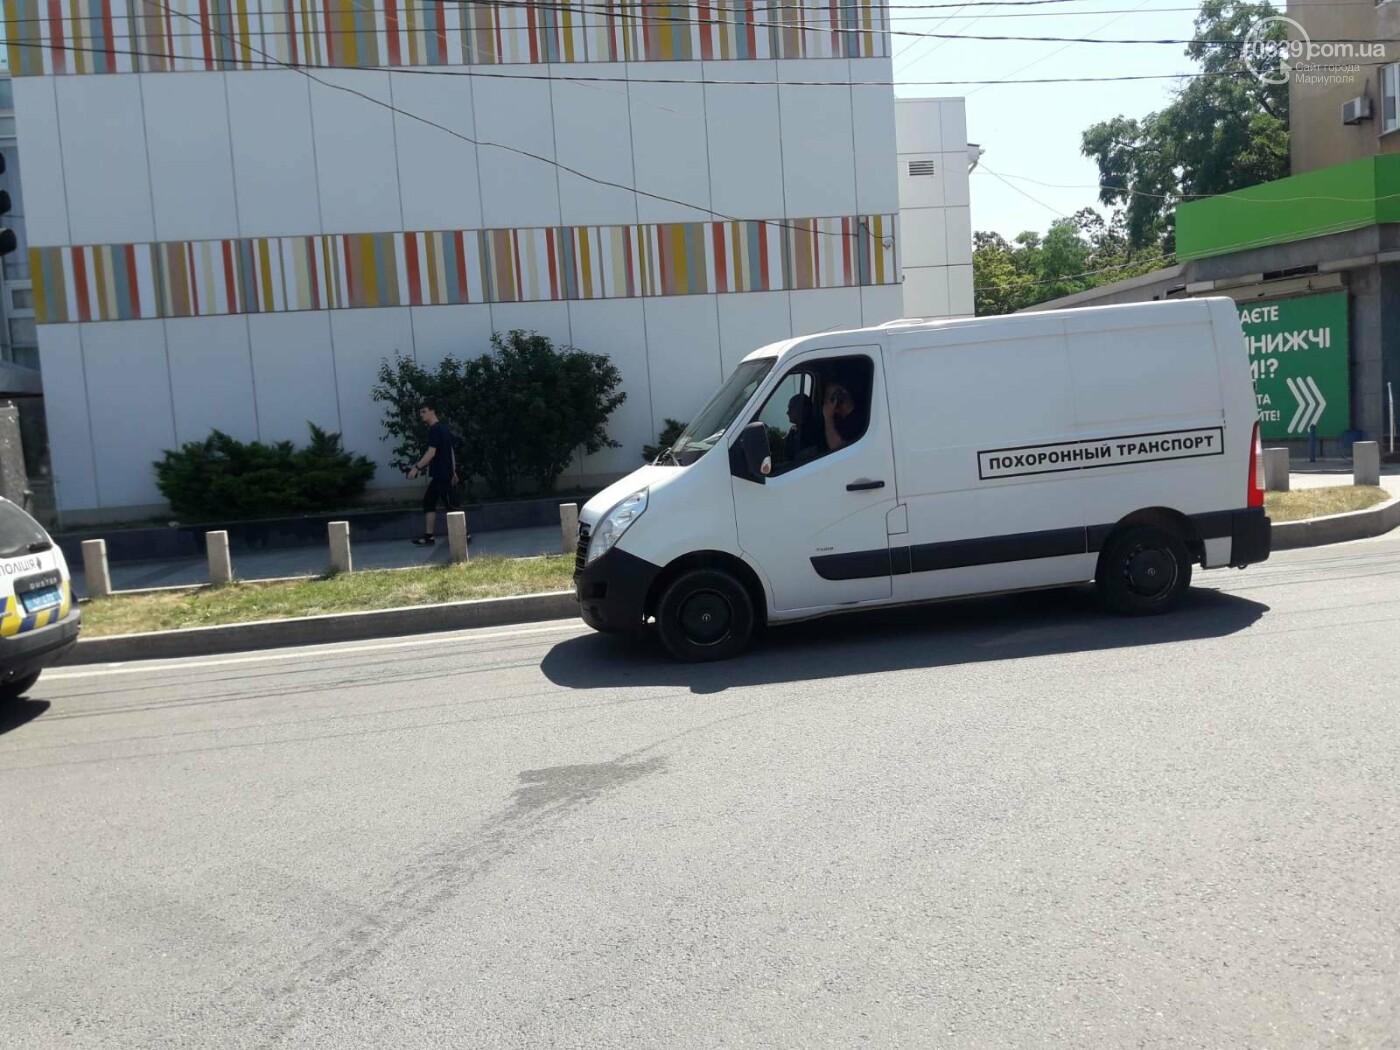 В центре Мариуполя внезапно умер мужчина, - ФОТО, фото-3